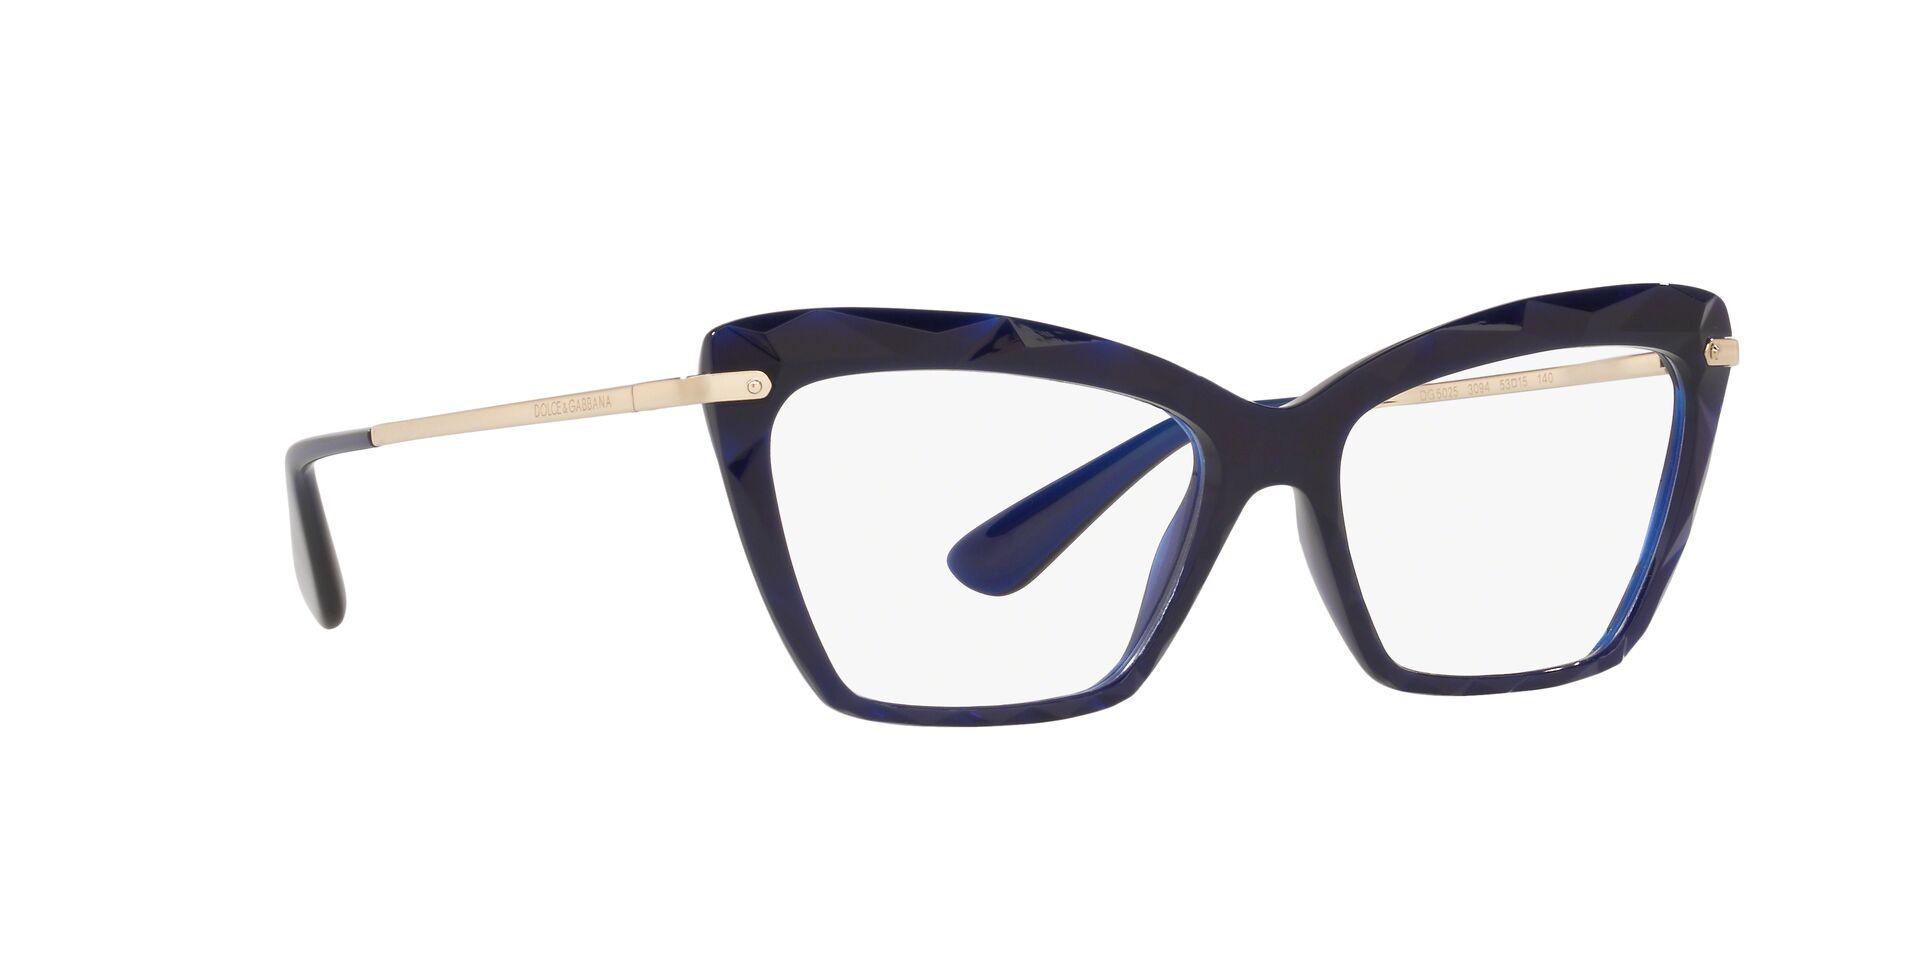 Óculos de Grau Dolce & Gabbana DG5025 3094 53